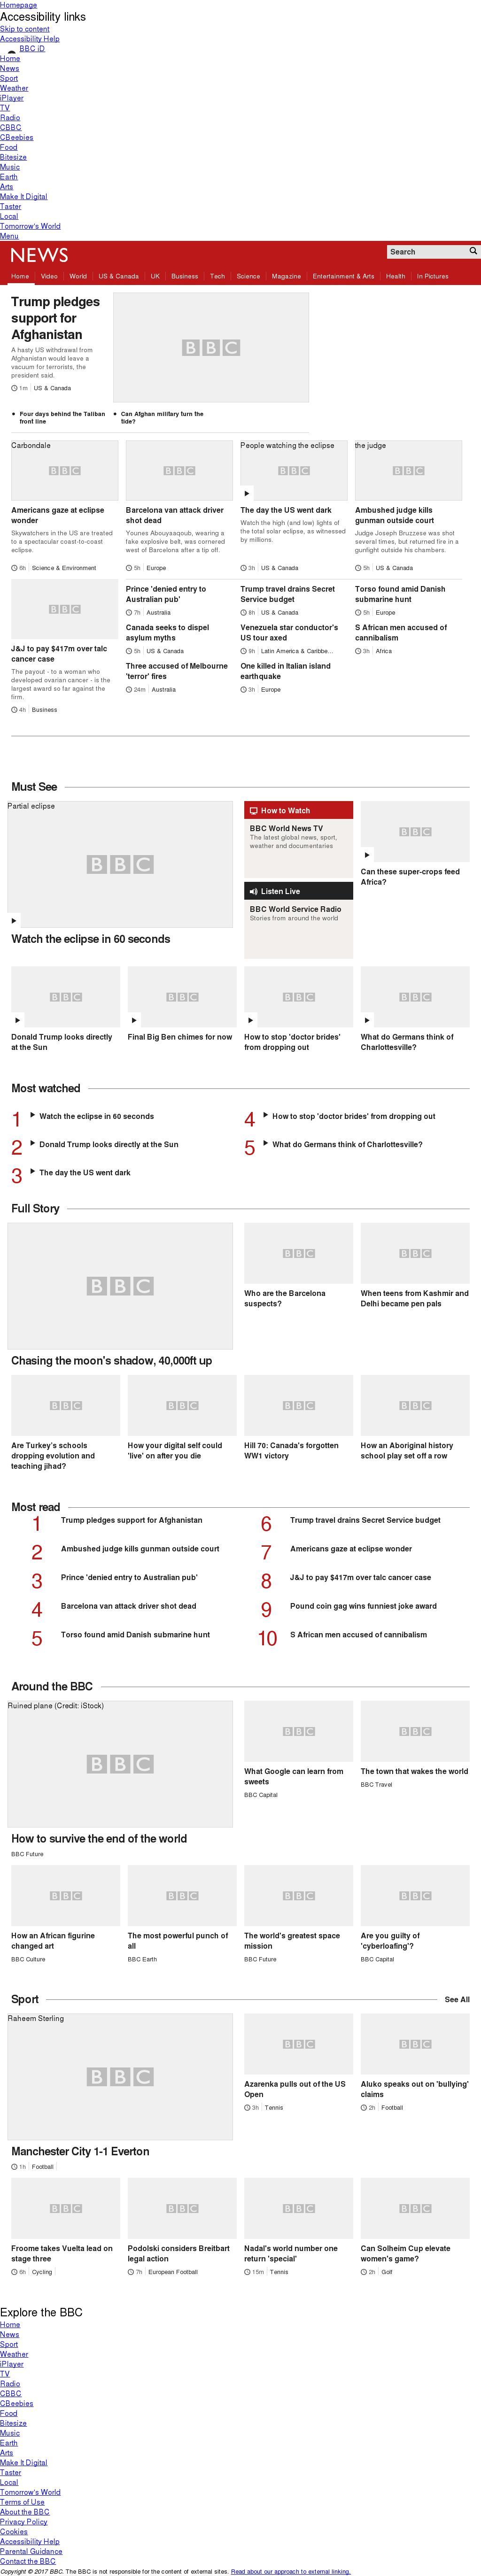 BBC at Tuesday Aug. 22, 2017, 2 a.m. UTC